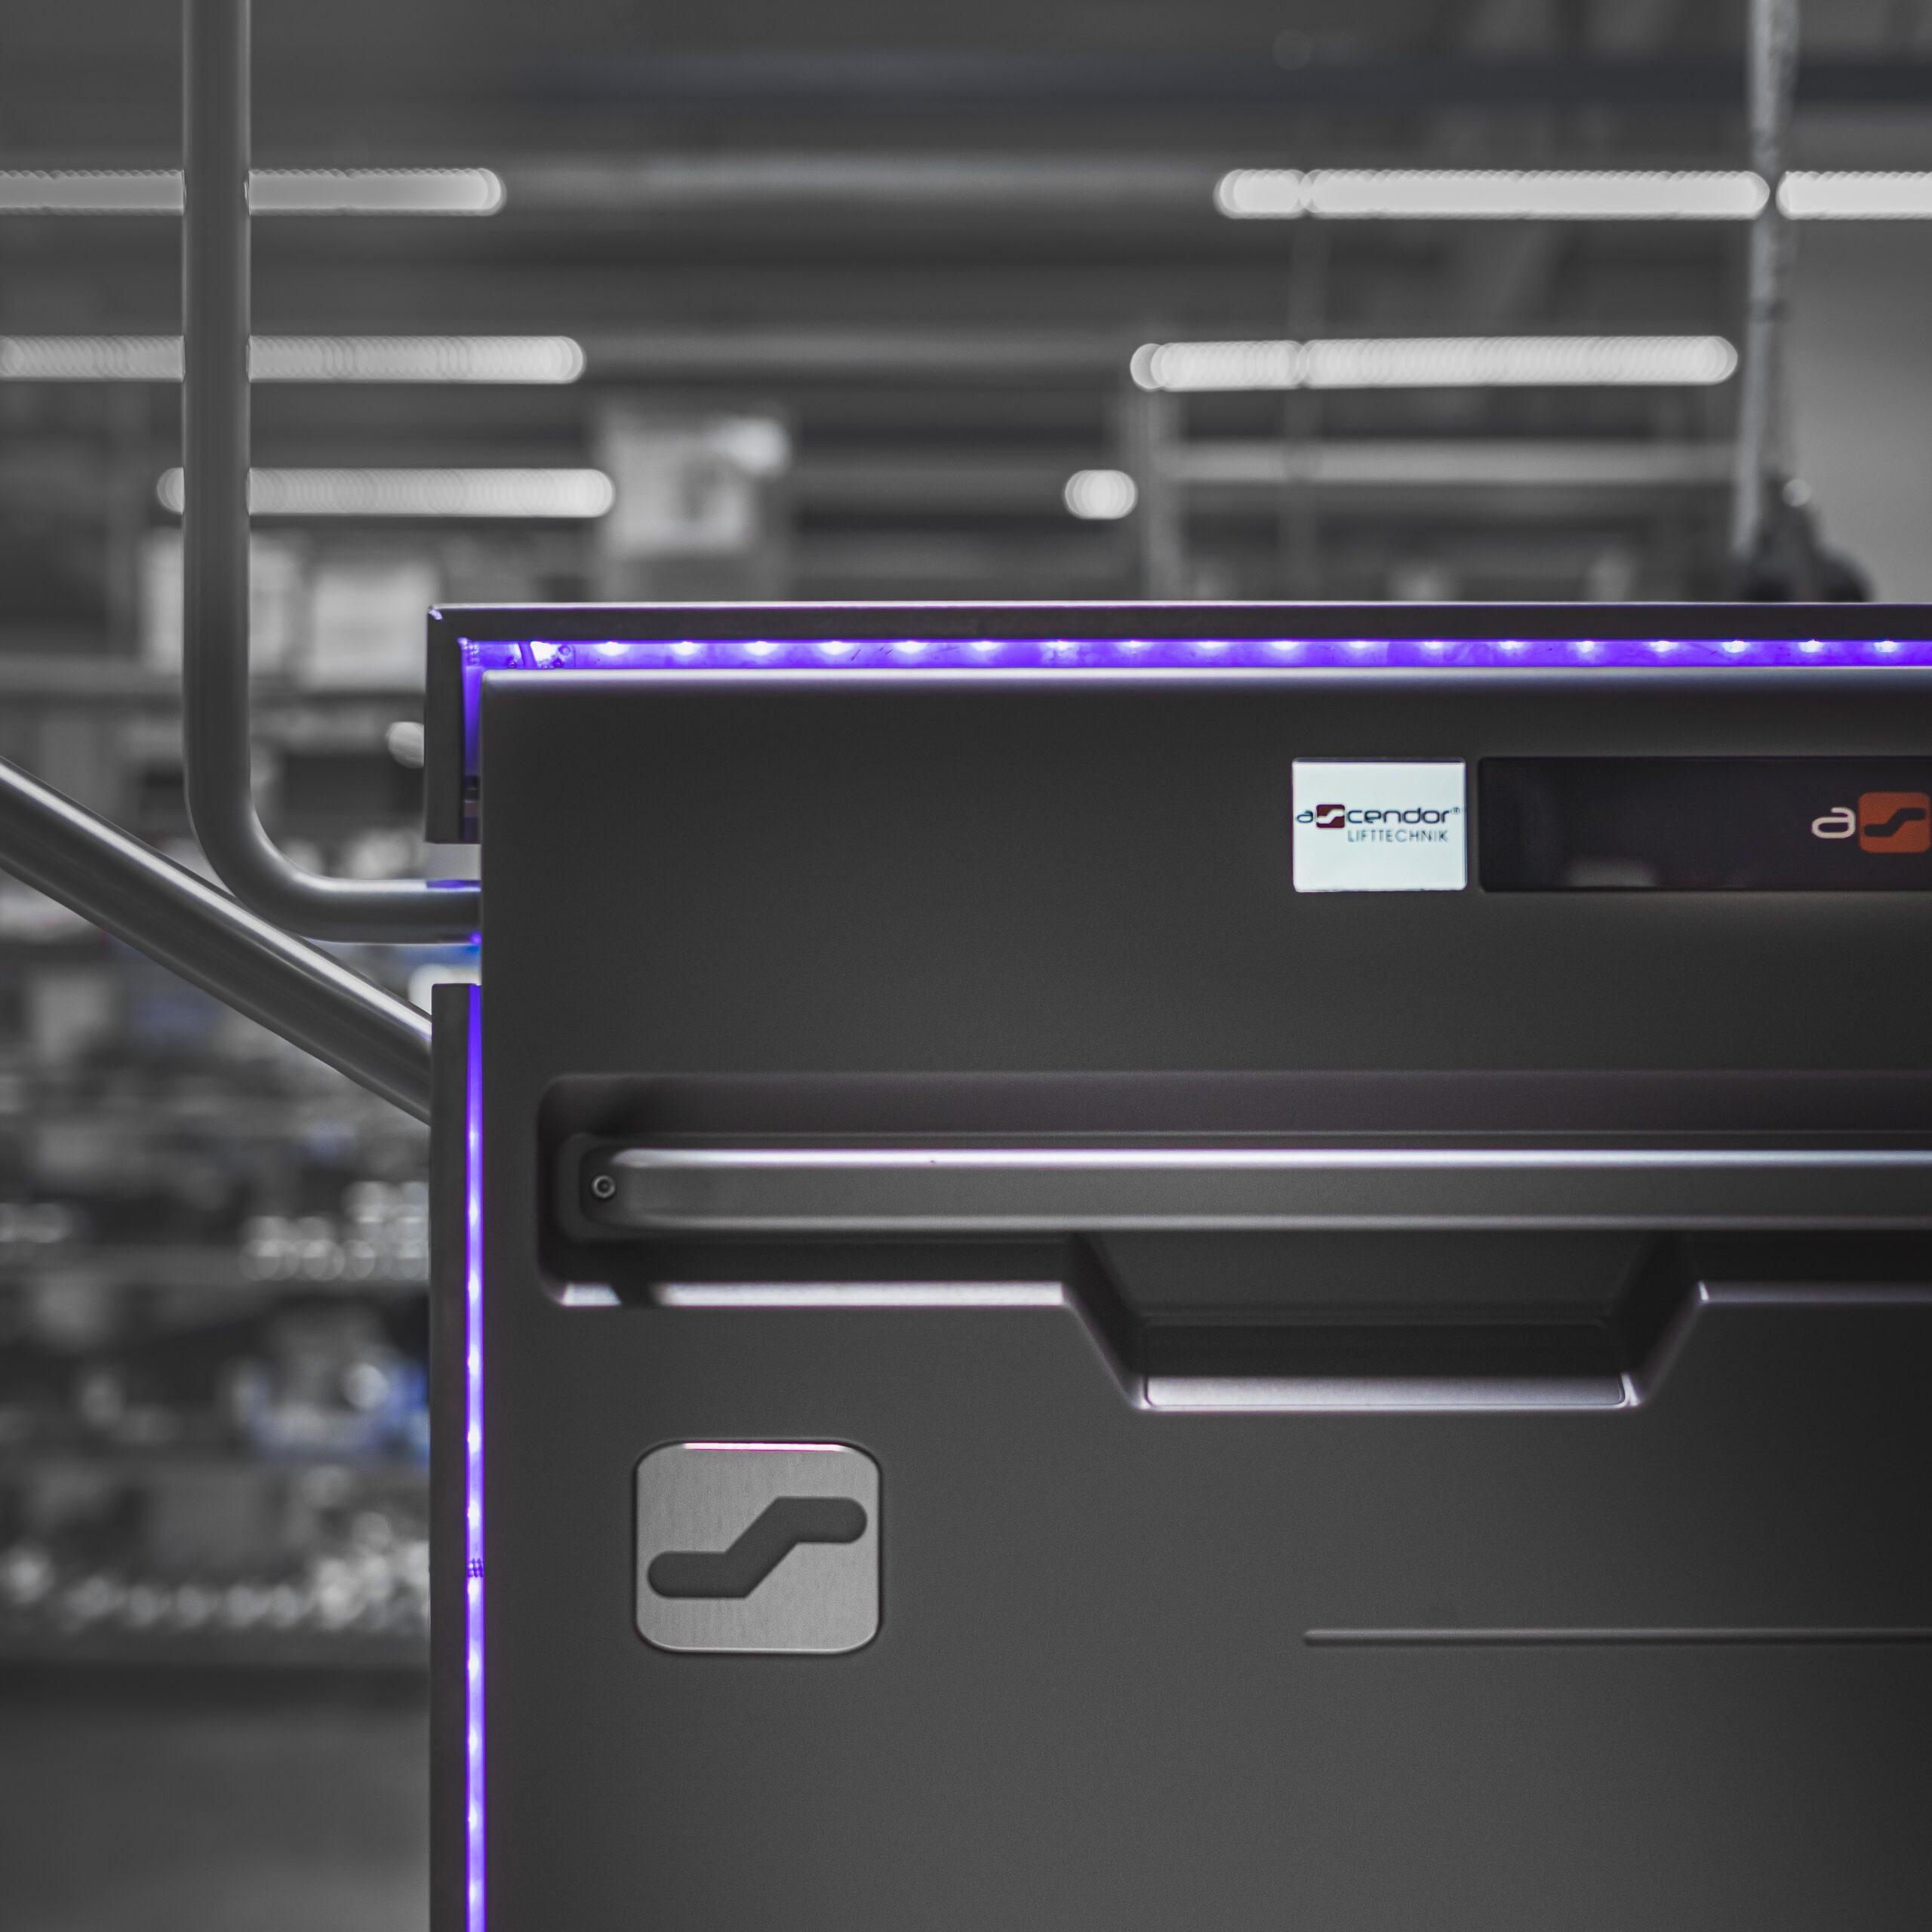 LED RGB Beleuchtung Ascendor